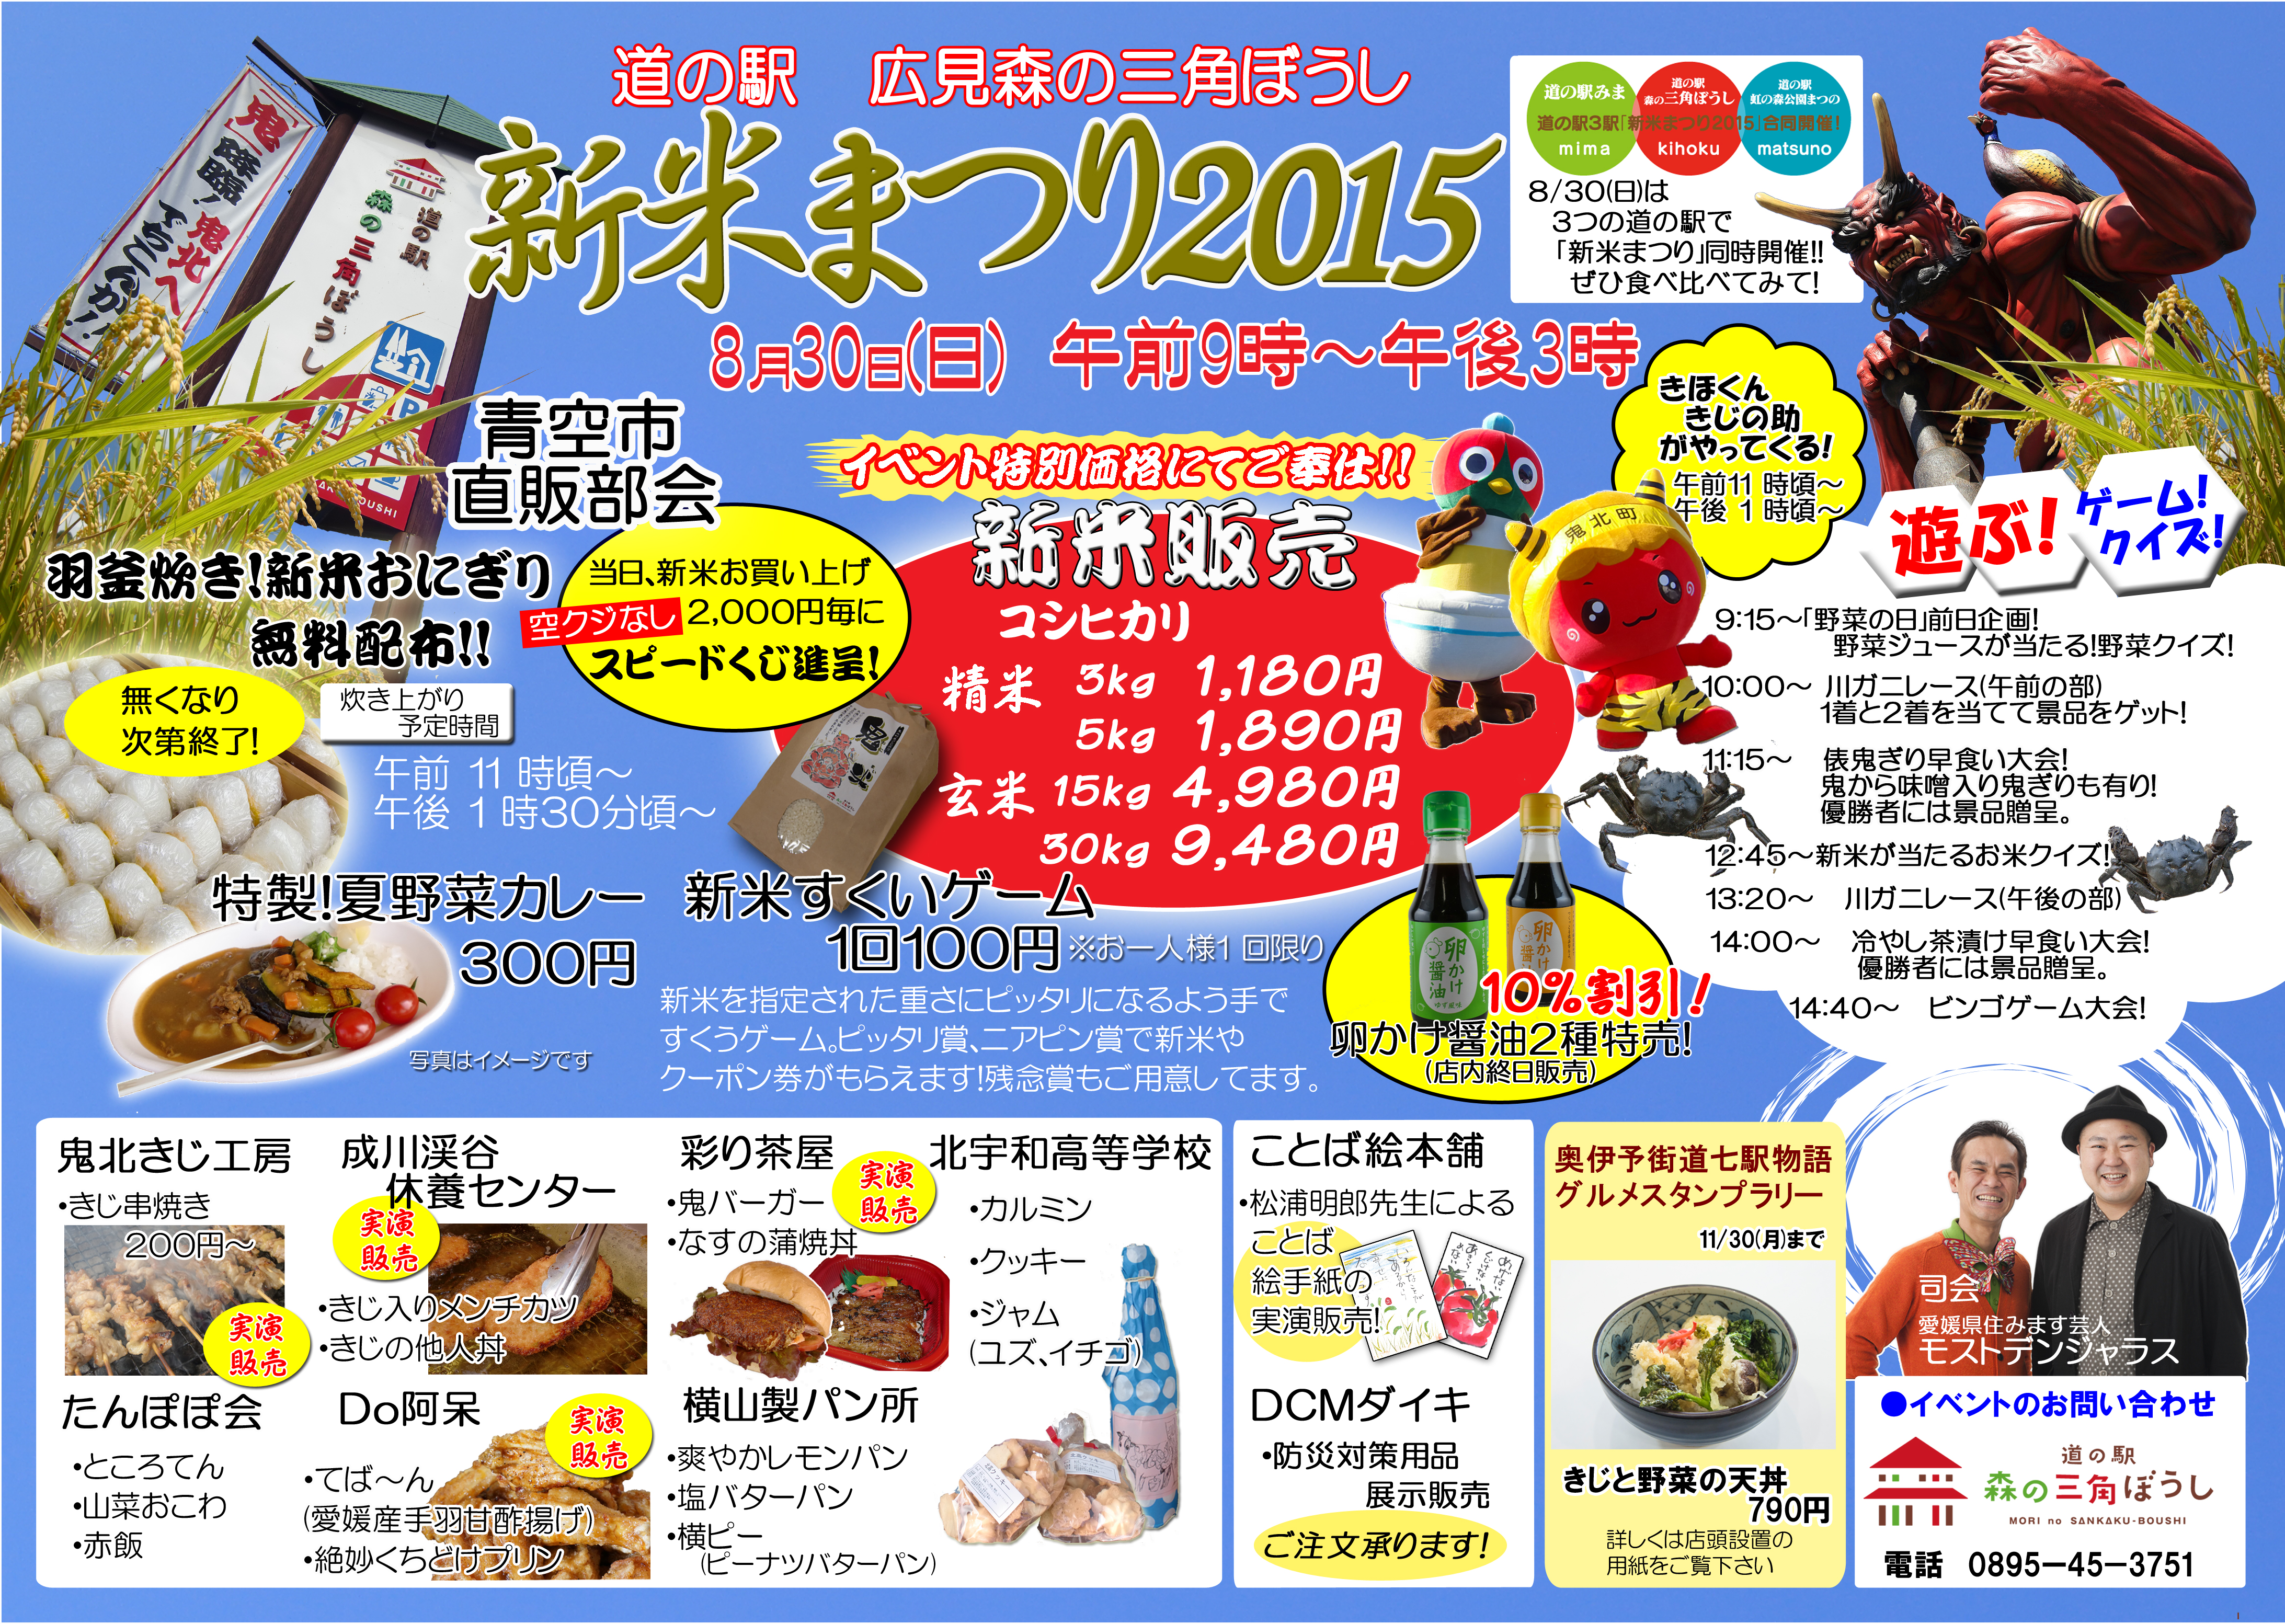 新米祭り2015ーfix jpg.jpg